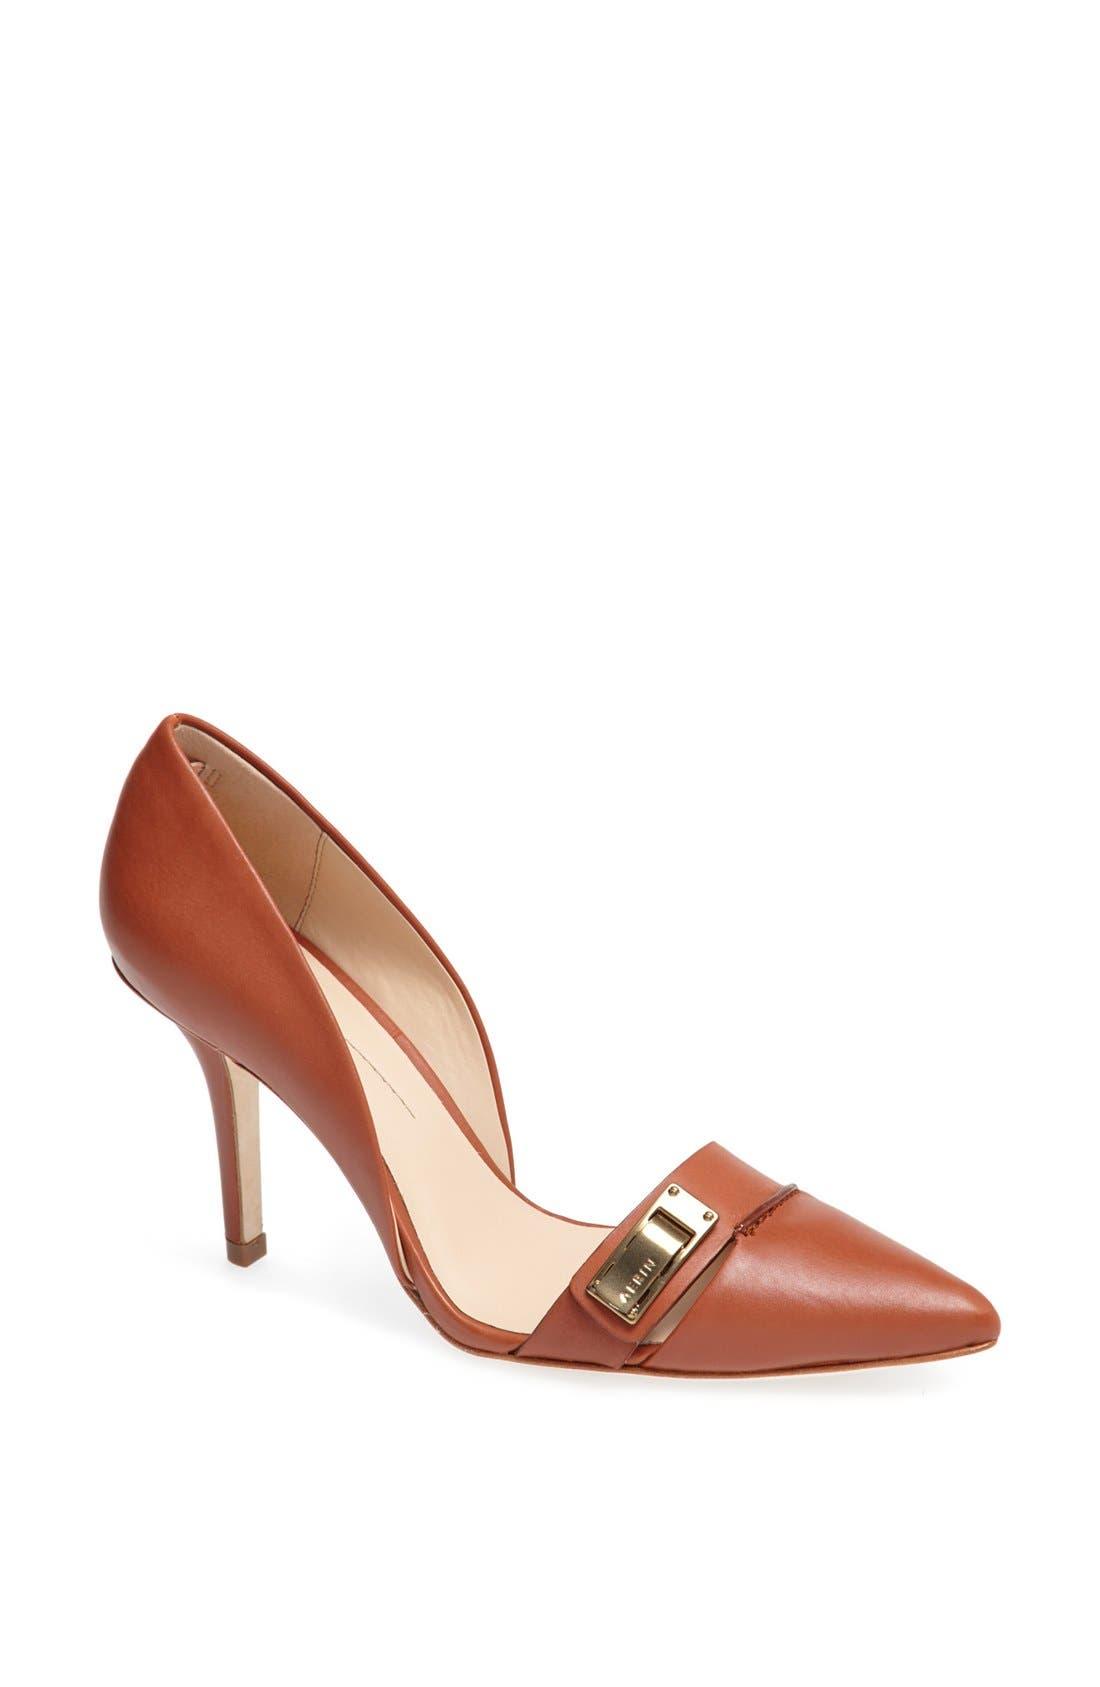 Main Image - Aerin 'Fatima' Leather Pointy Toe Pump